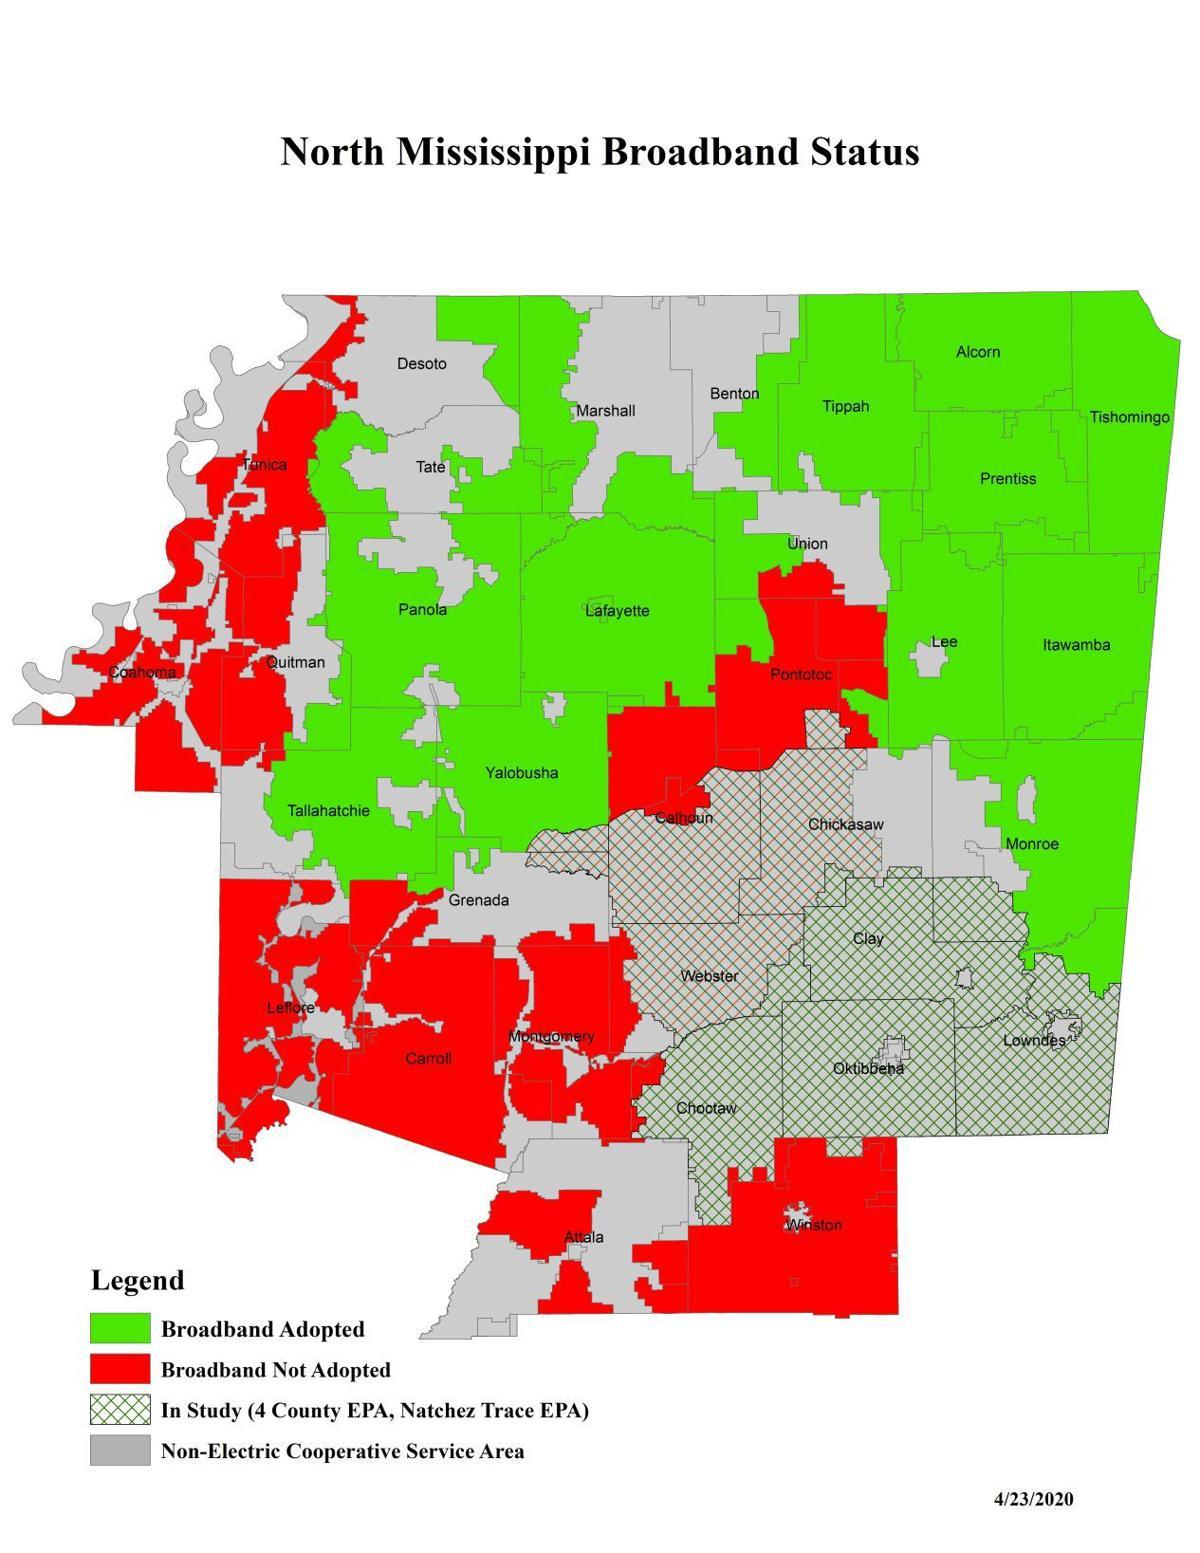 broadband status map